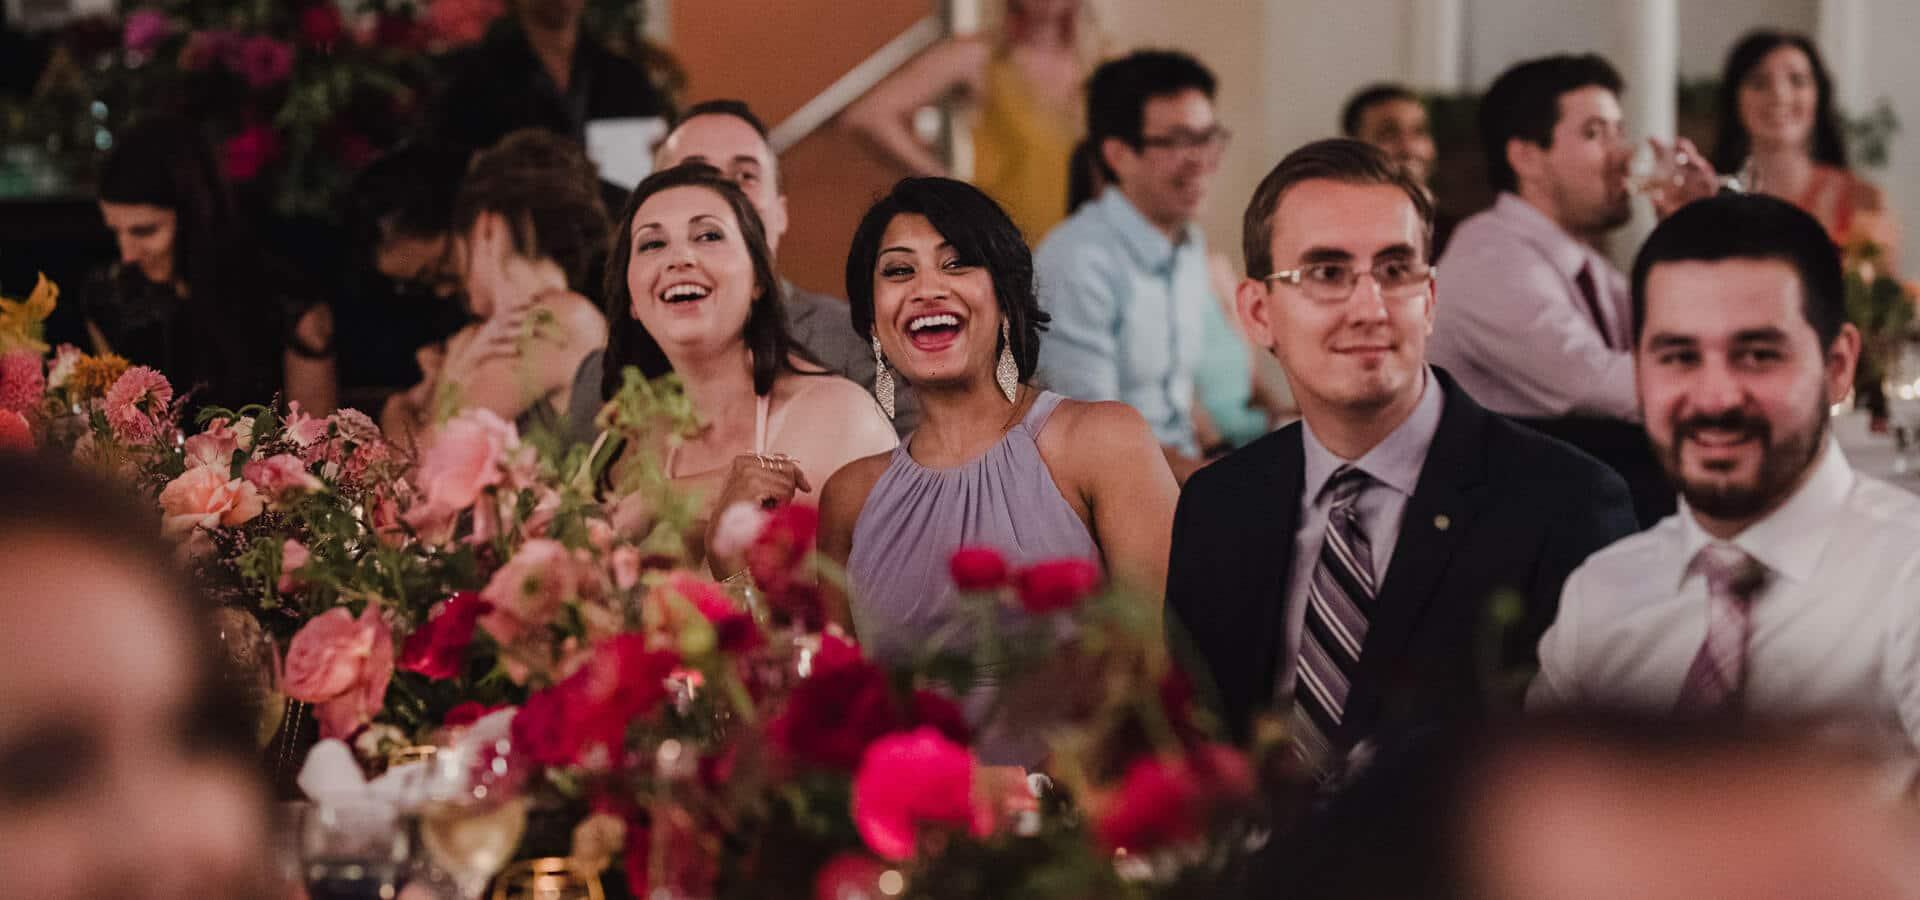 wedding guest